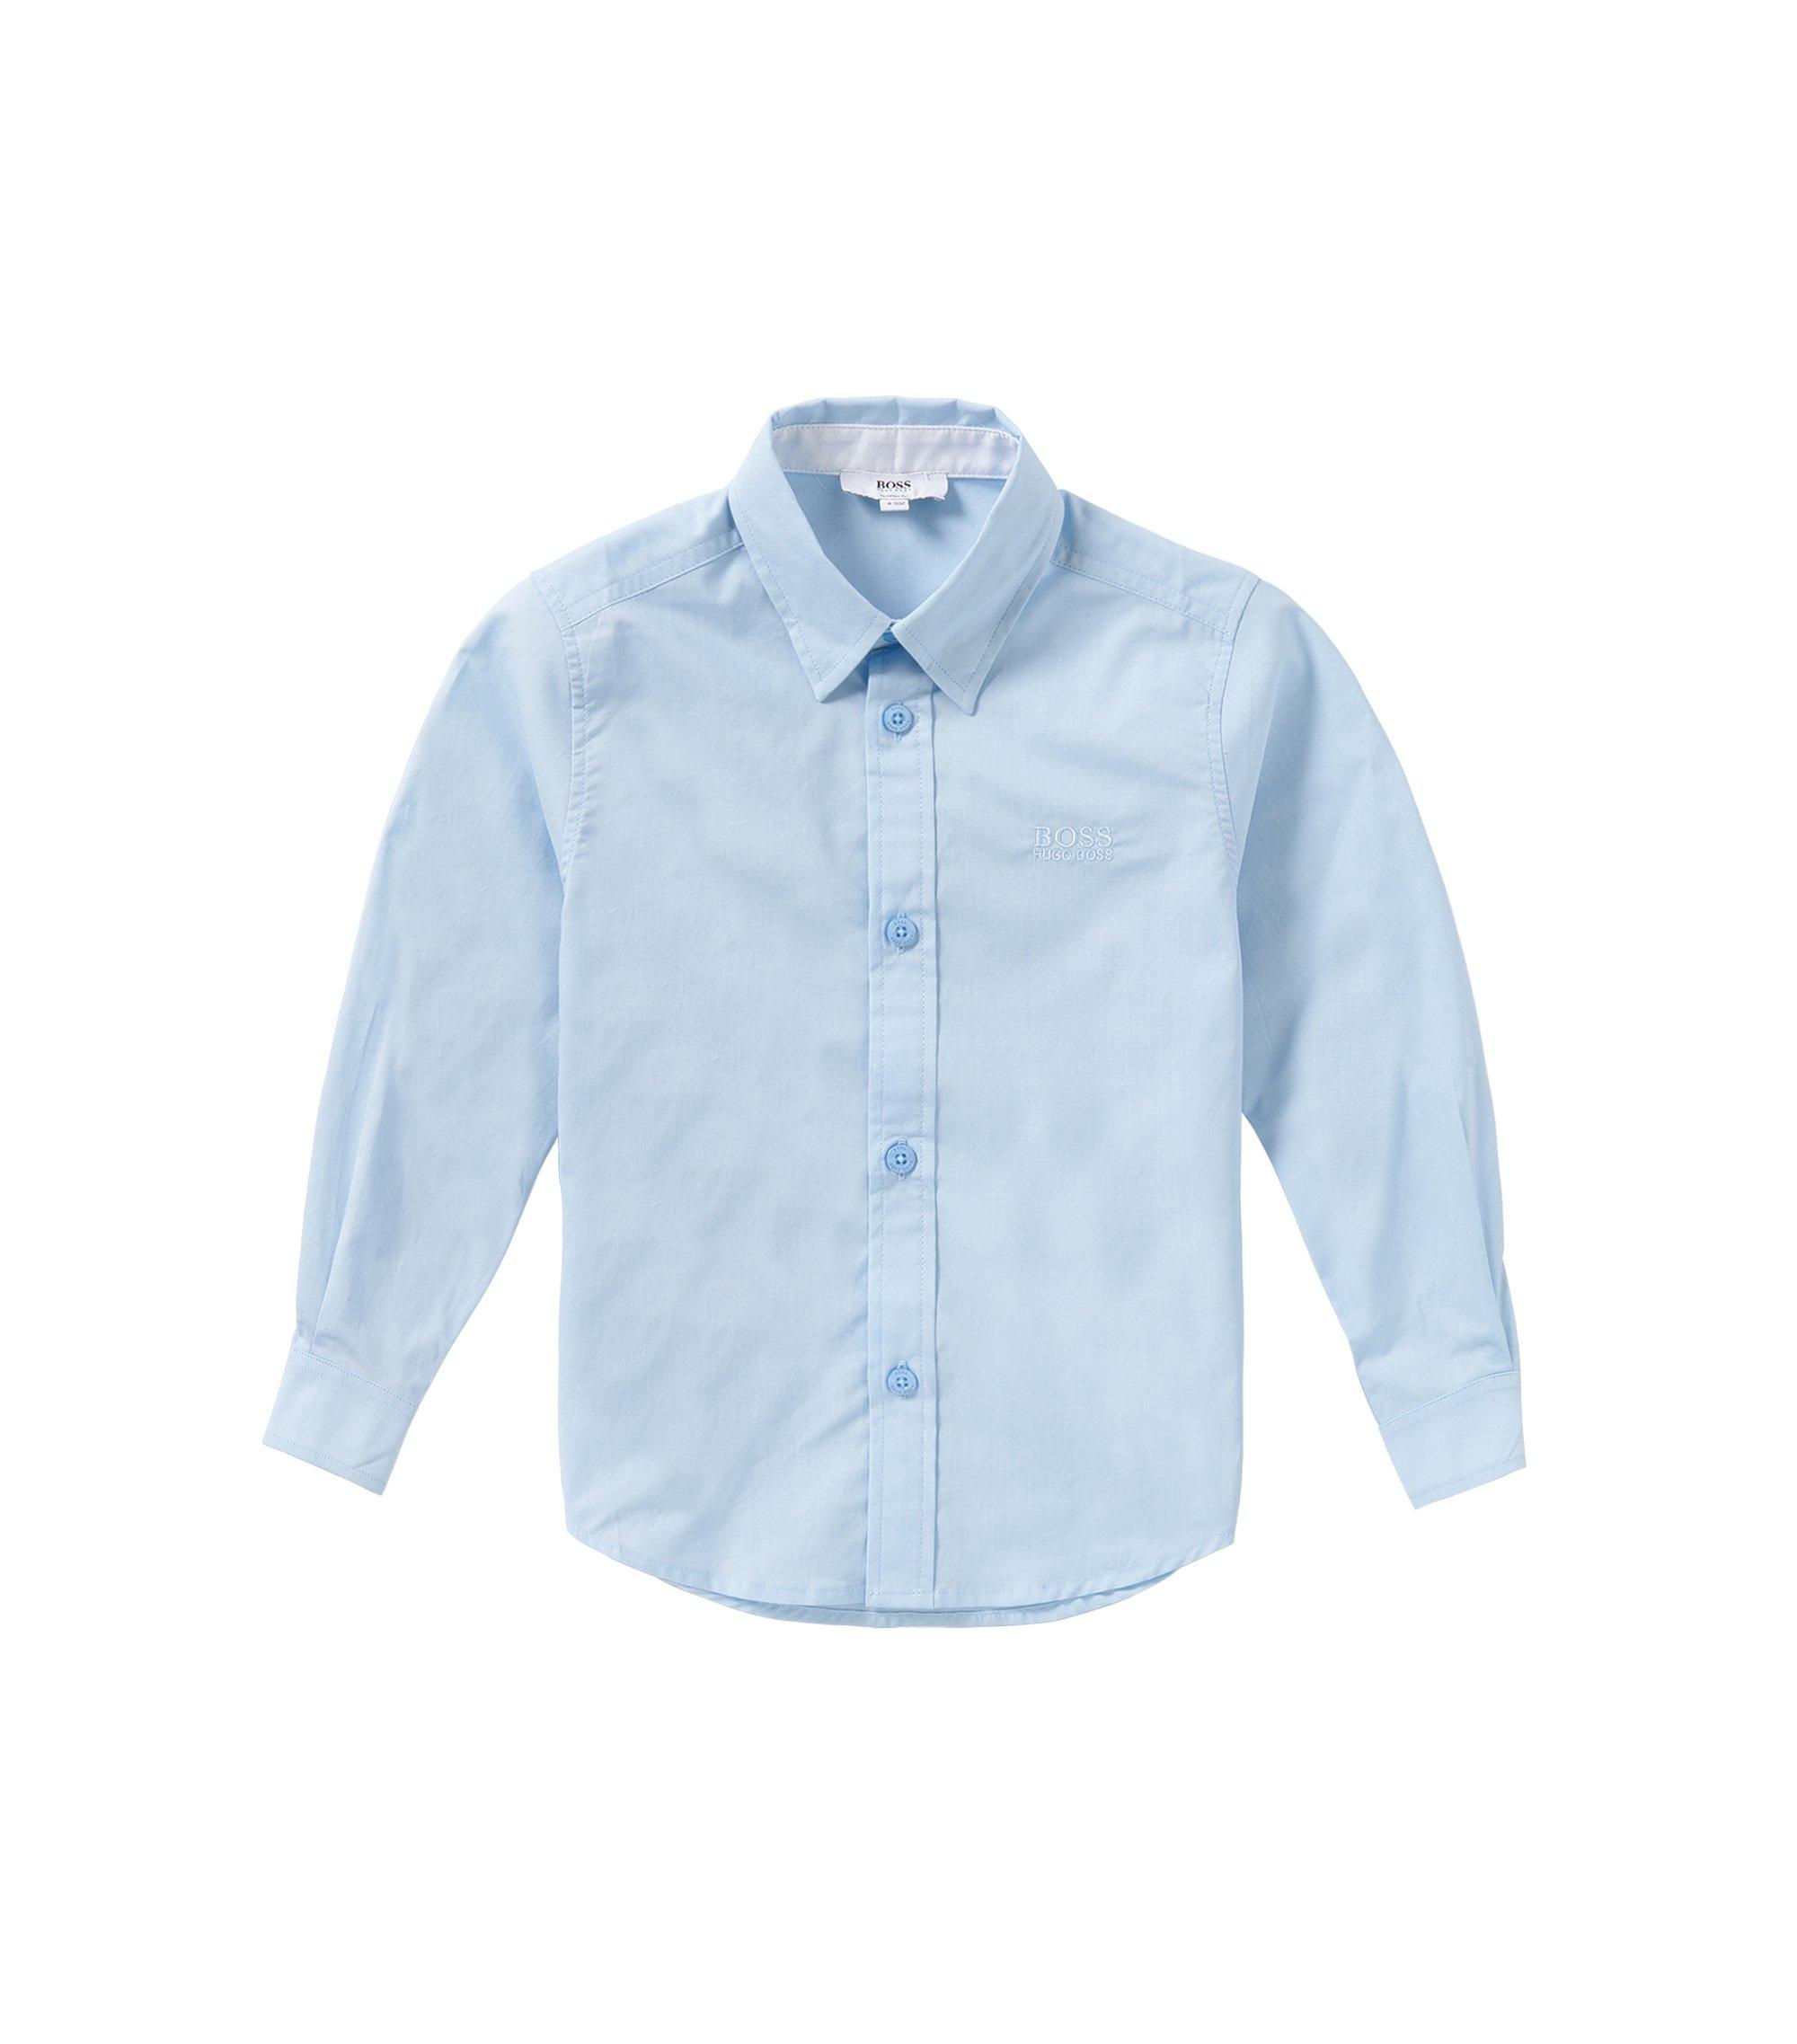 Regular-Fit Kids-Hemd aus Baumwolle: 'J25945', Hellblau